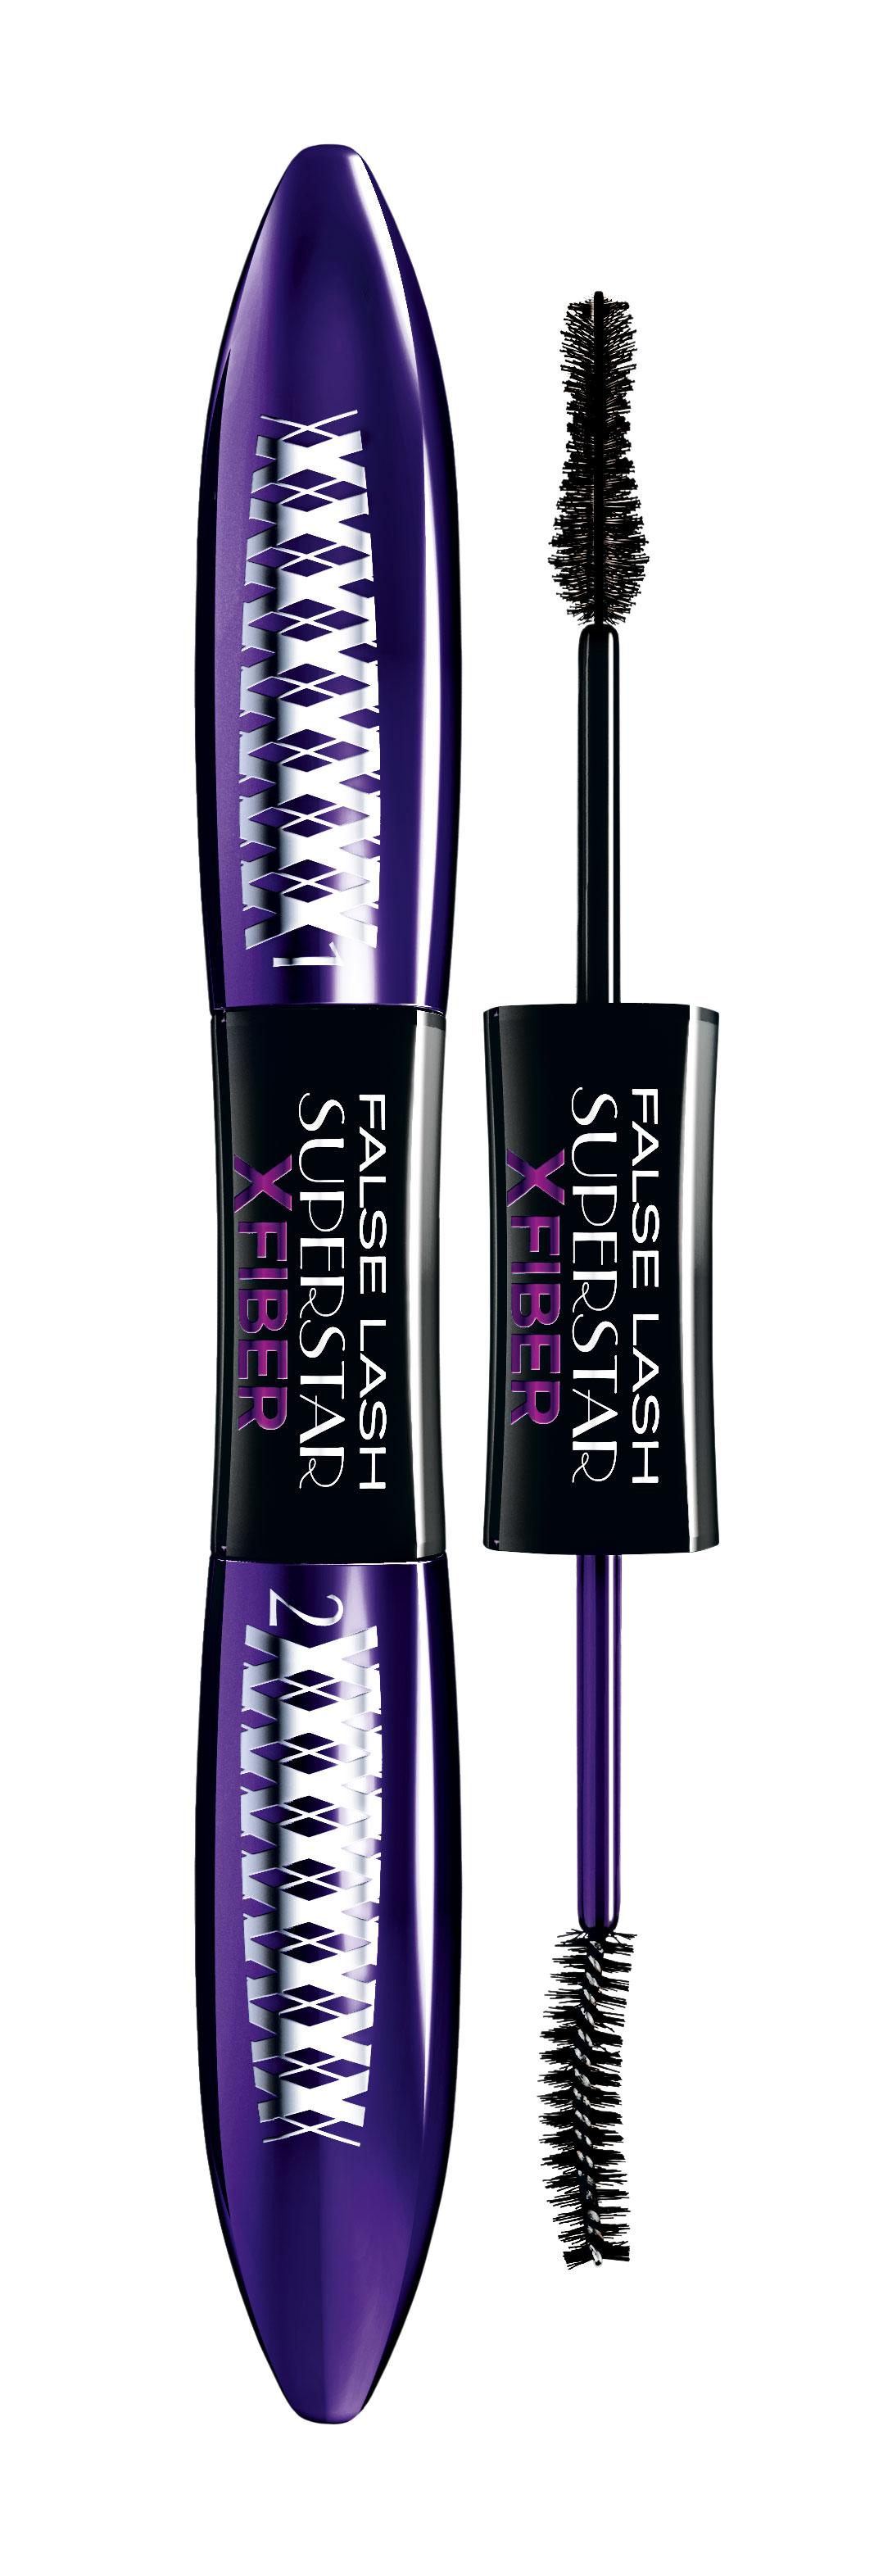 "מסקרה אקס פיבר 6.9 מ""ל XFIBER L'Oréal Paris"